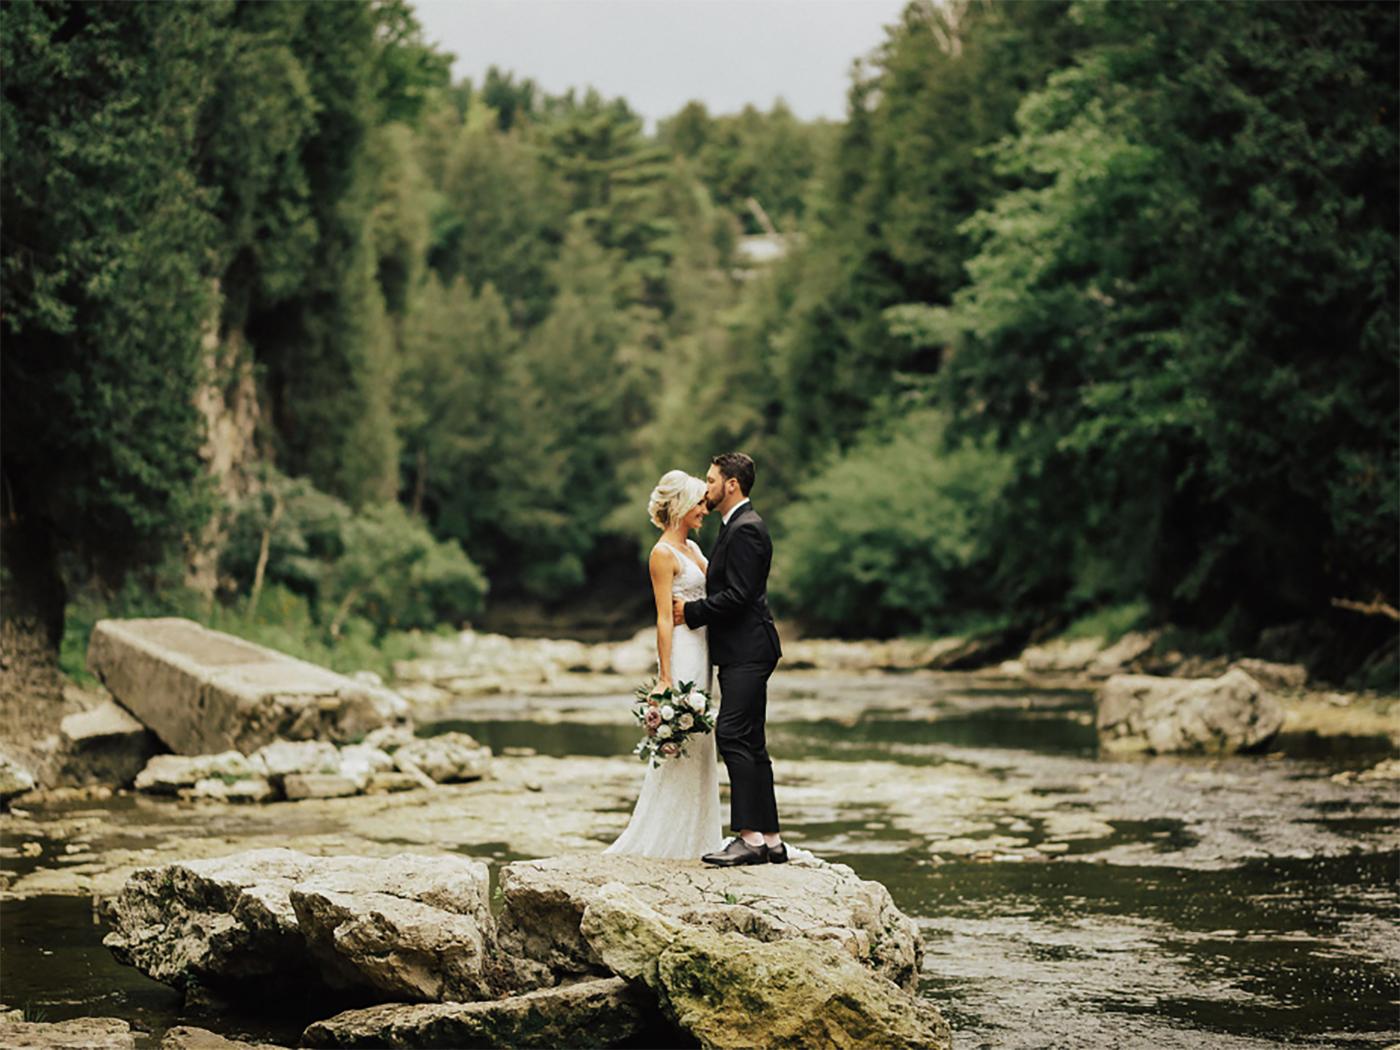 Brett & Andrea's Wedding Elora Mill Pearle Weddings Aidan Hennebry Hush Hush Wedding Films Photography & Film Hamilton Ontario Toronto Videographer Videography Niagara.jpg